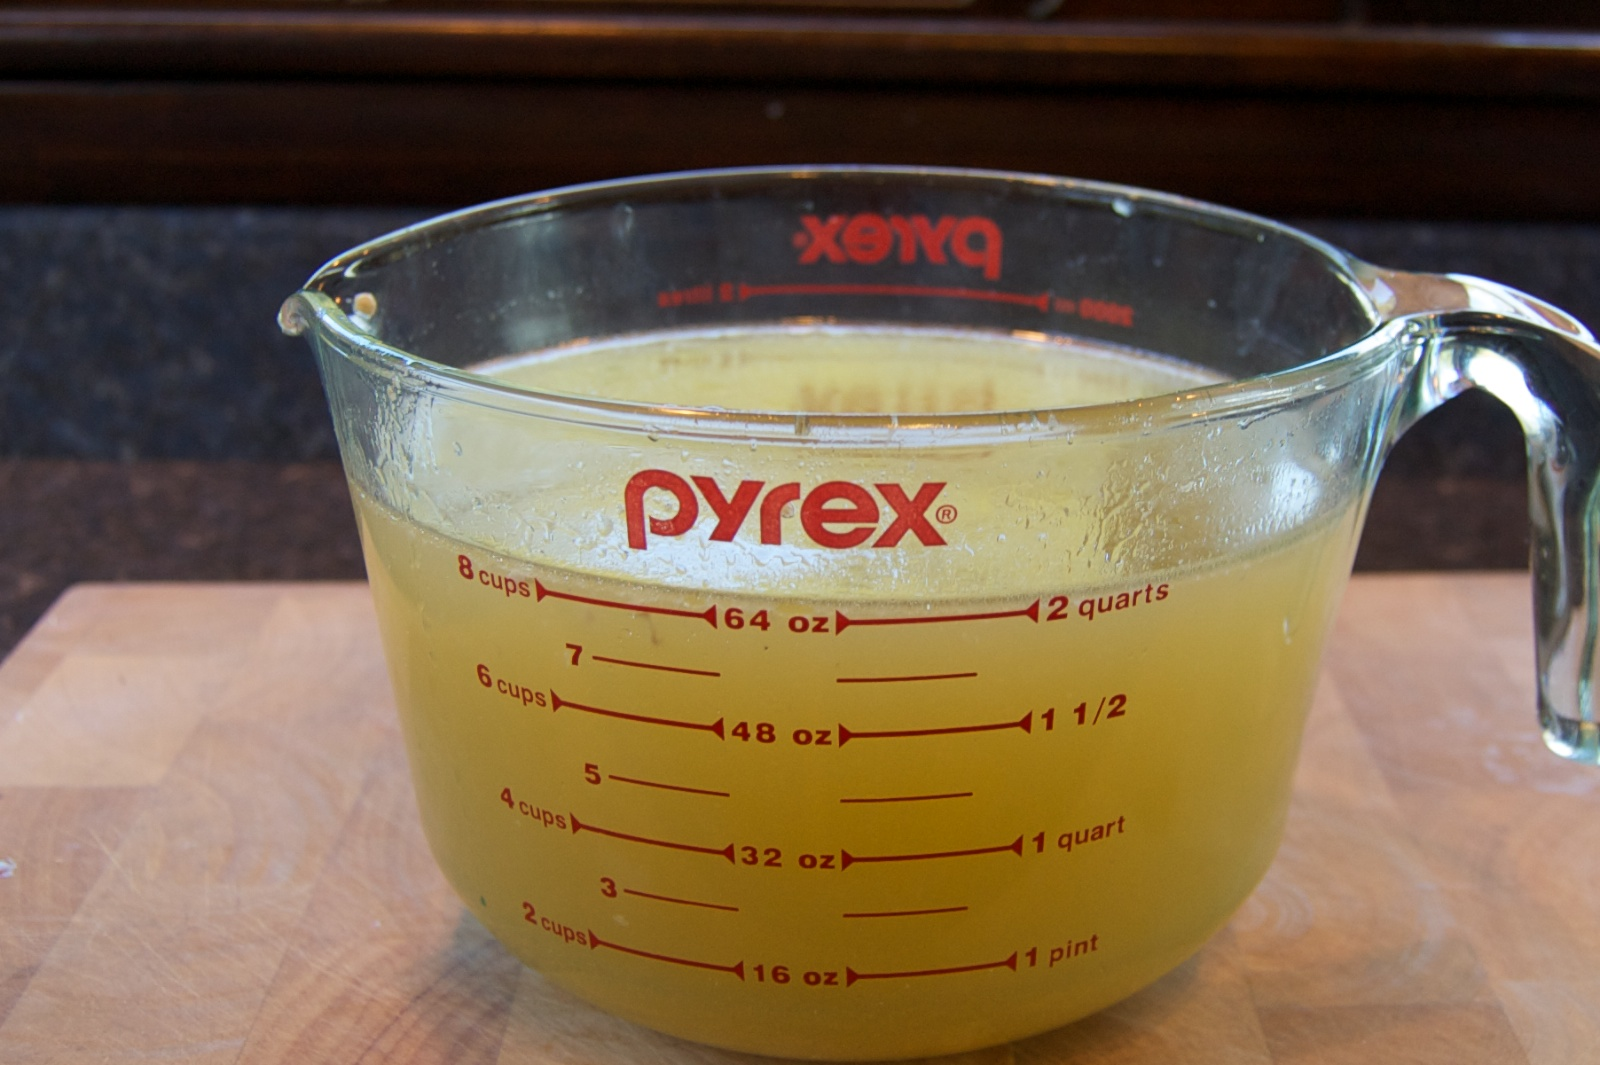 http://blog.rickk.com/food/2012/09/27/ate.2012.09.27.c7.jpg